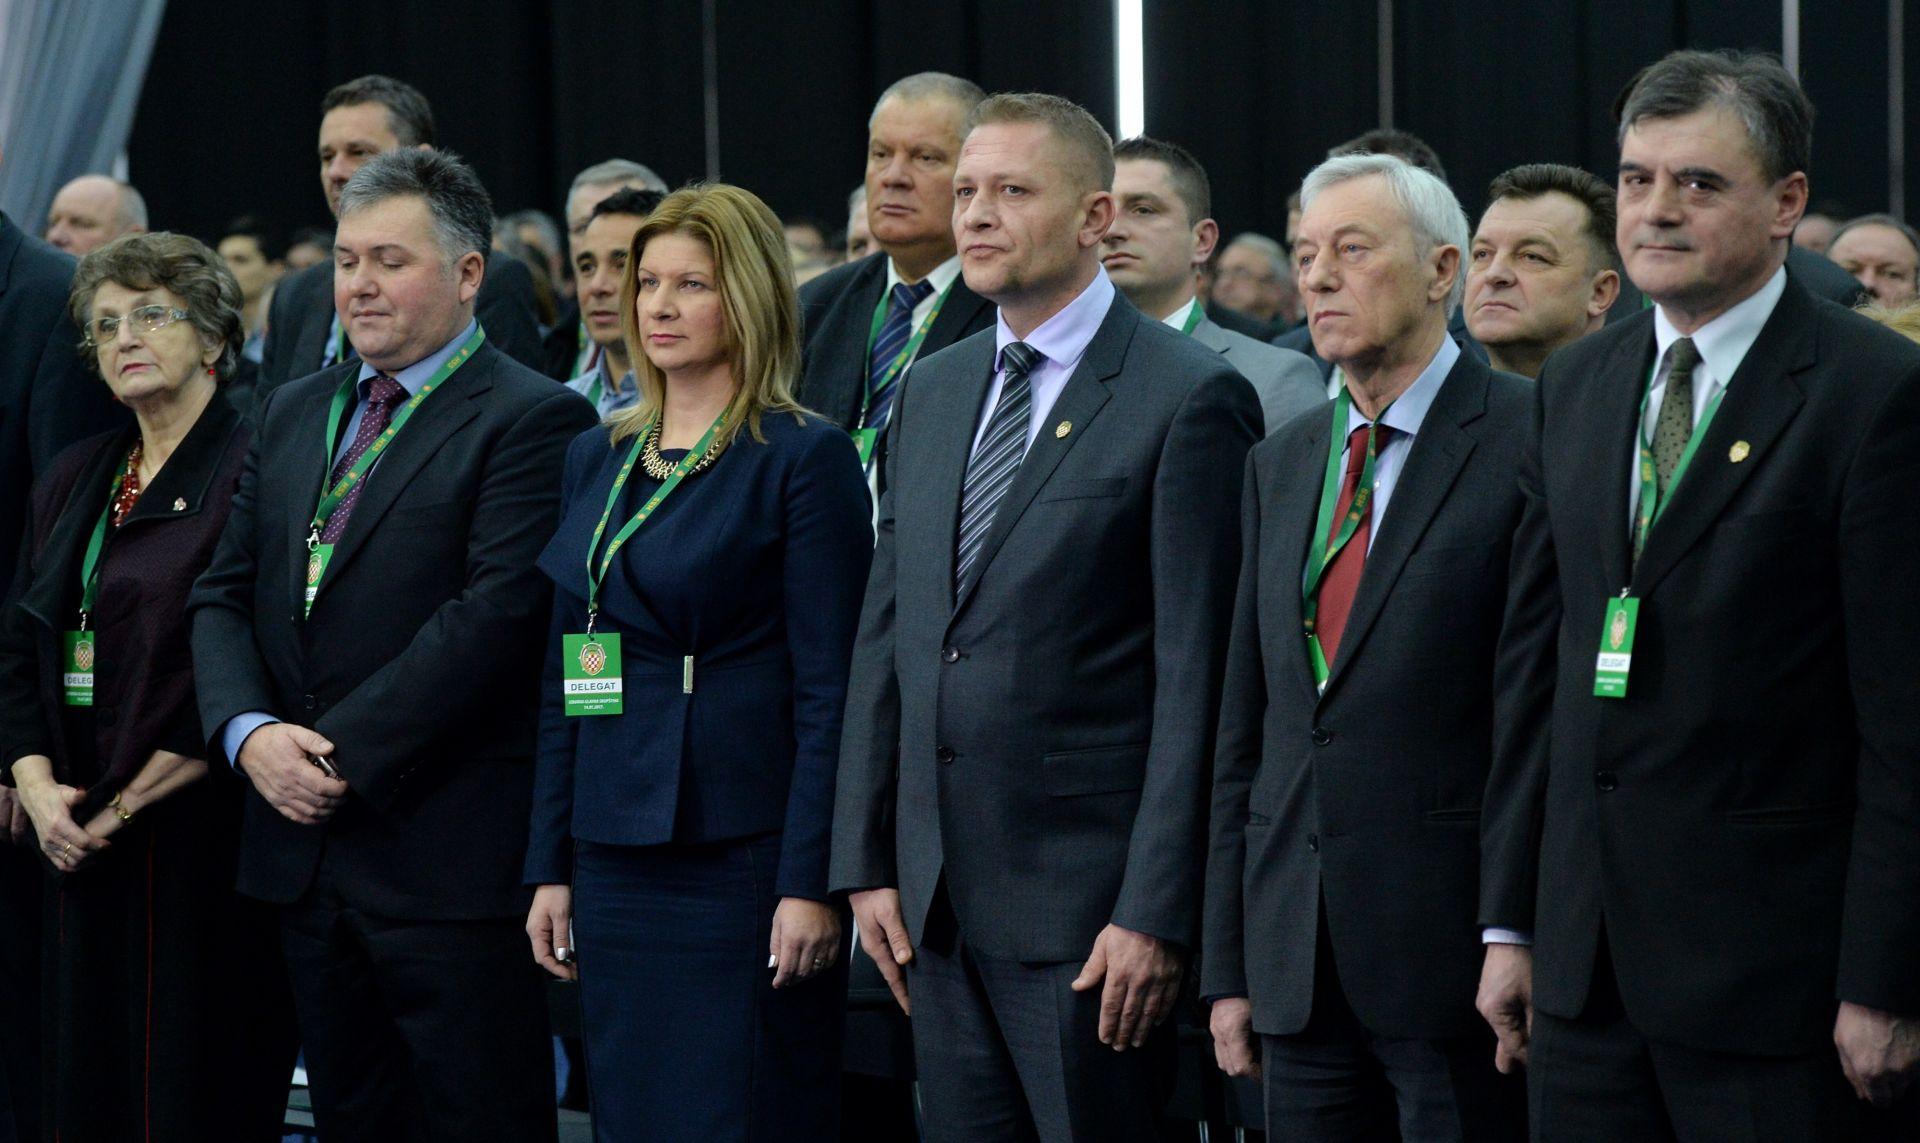 LOKALNI IZBORI: HSS dogovorio koaliciju s HDZ-om i HSLS-om